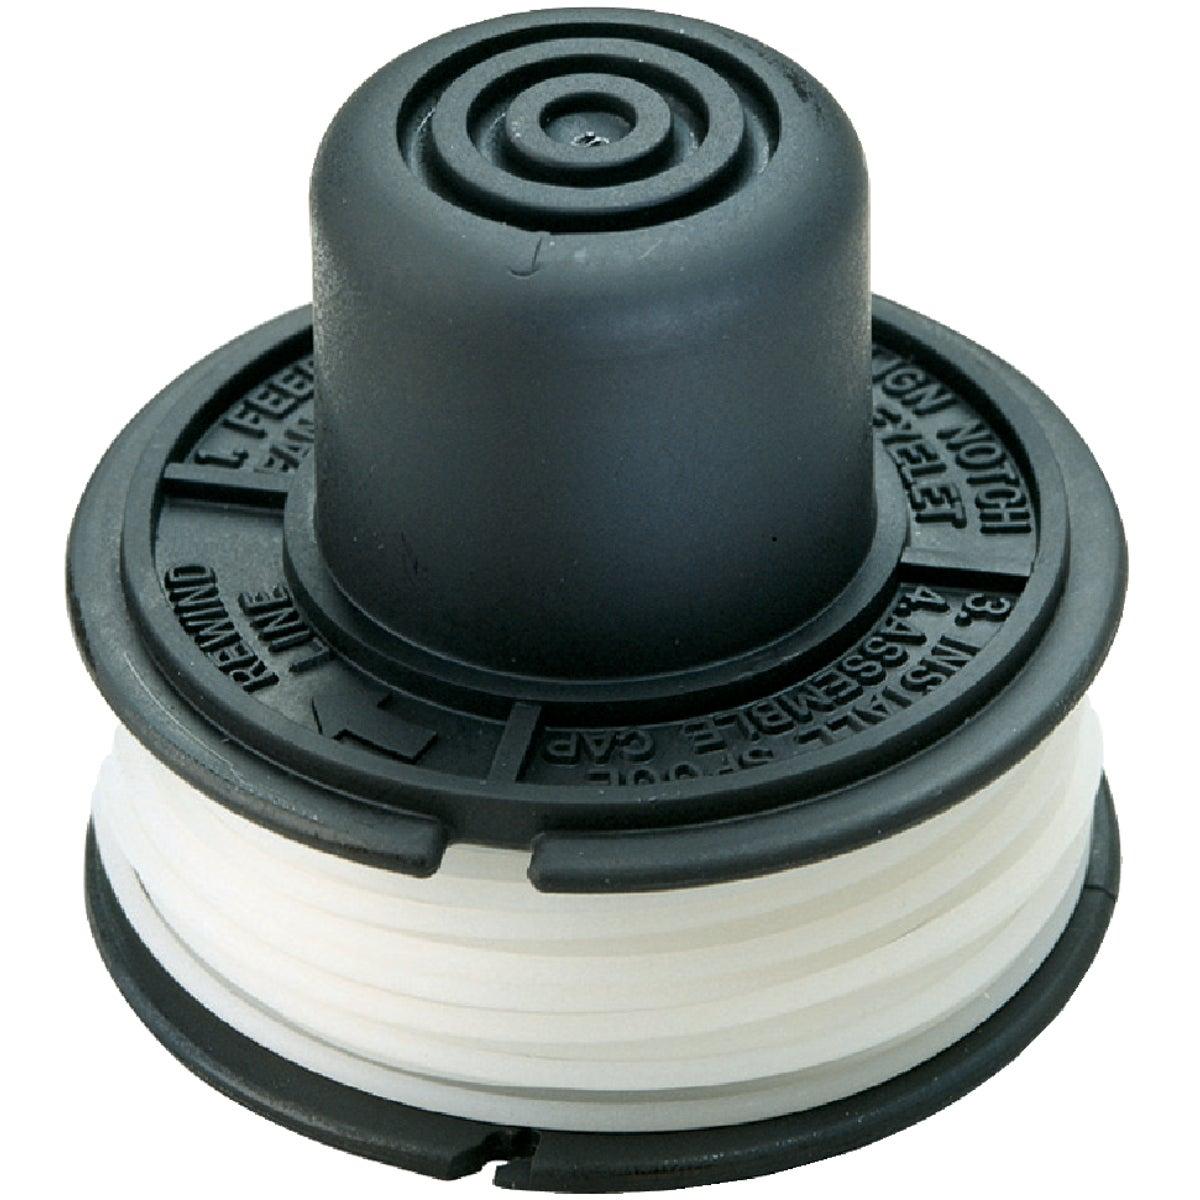 Black & Decker Bump Feed Trimmer Line Spool, RS-136